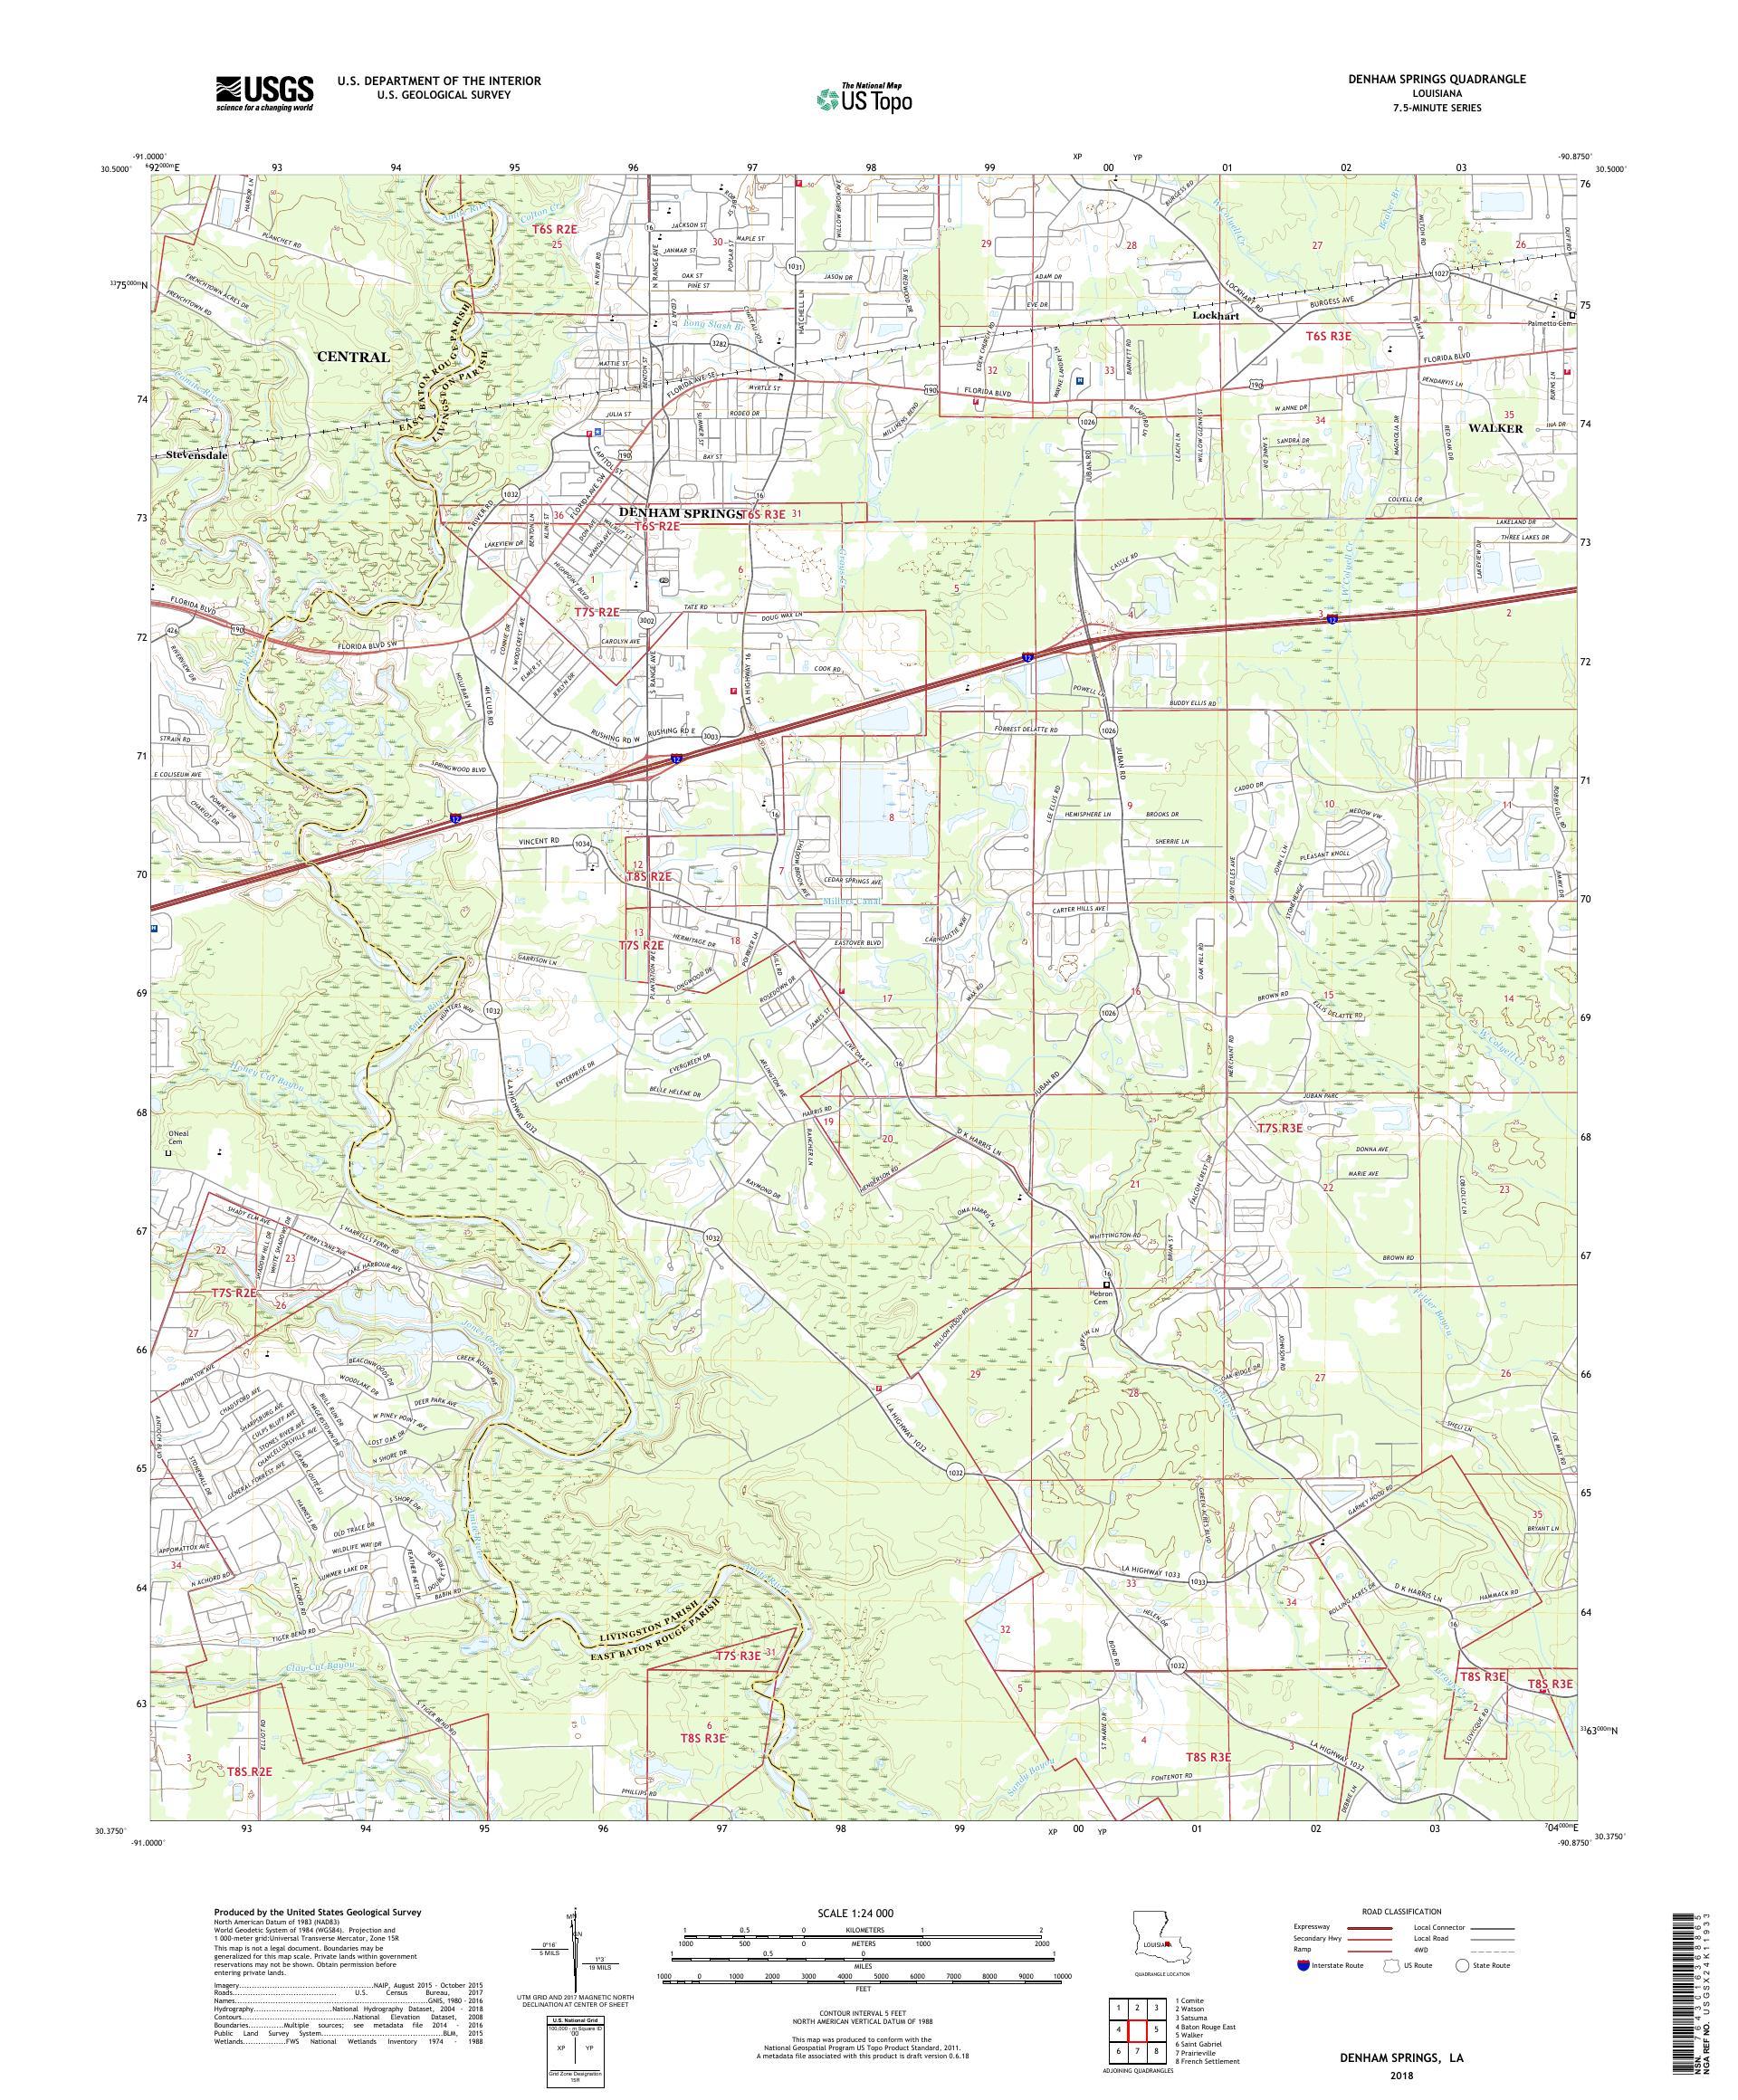 MyTopo Denham Springs, Louisiana USGS Quad Topo Map on